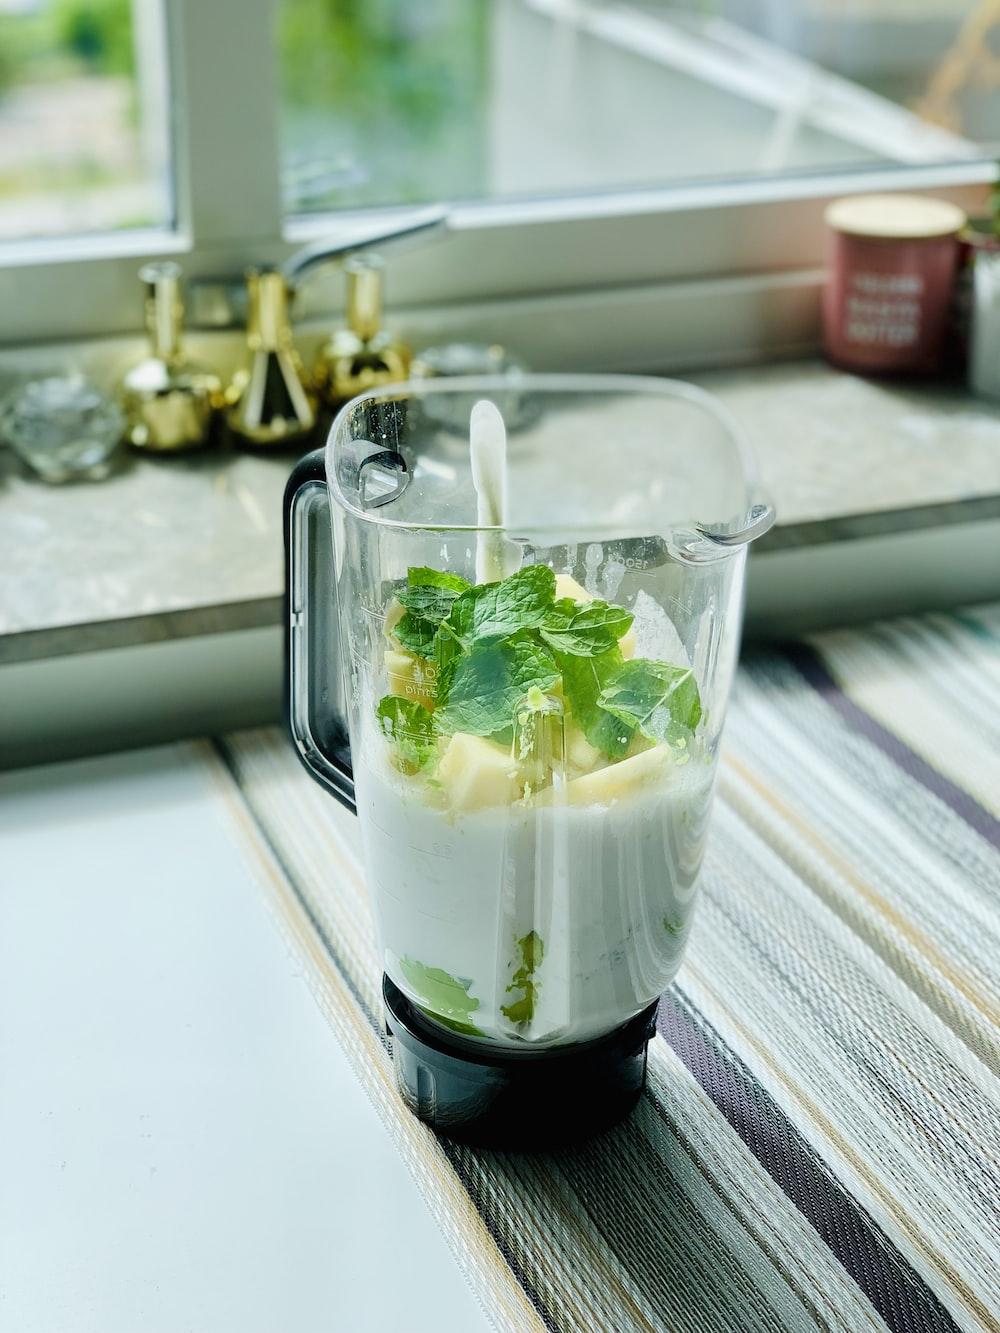 clear glass mug with white liquid